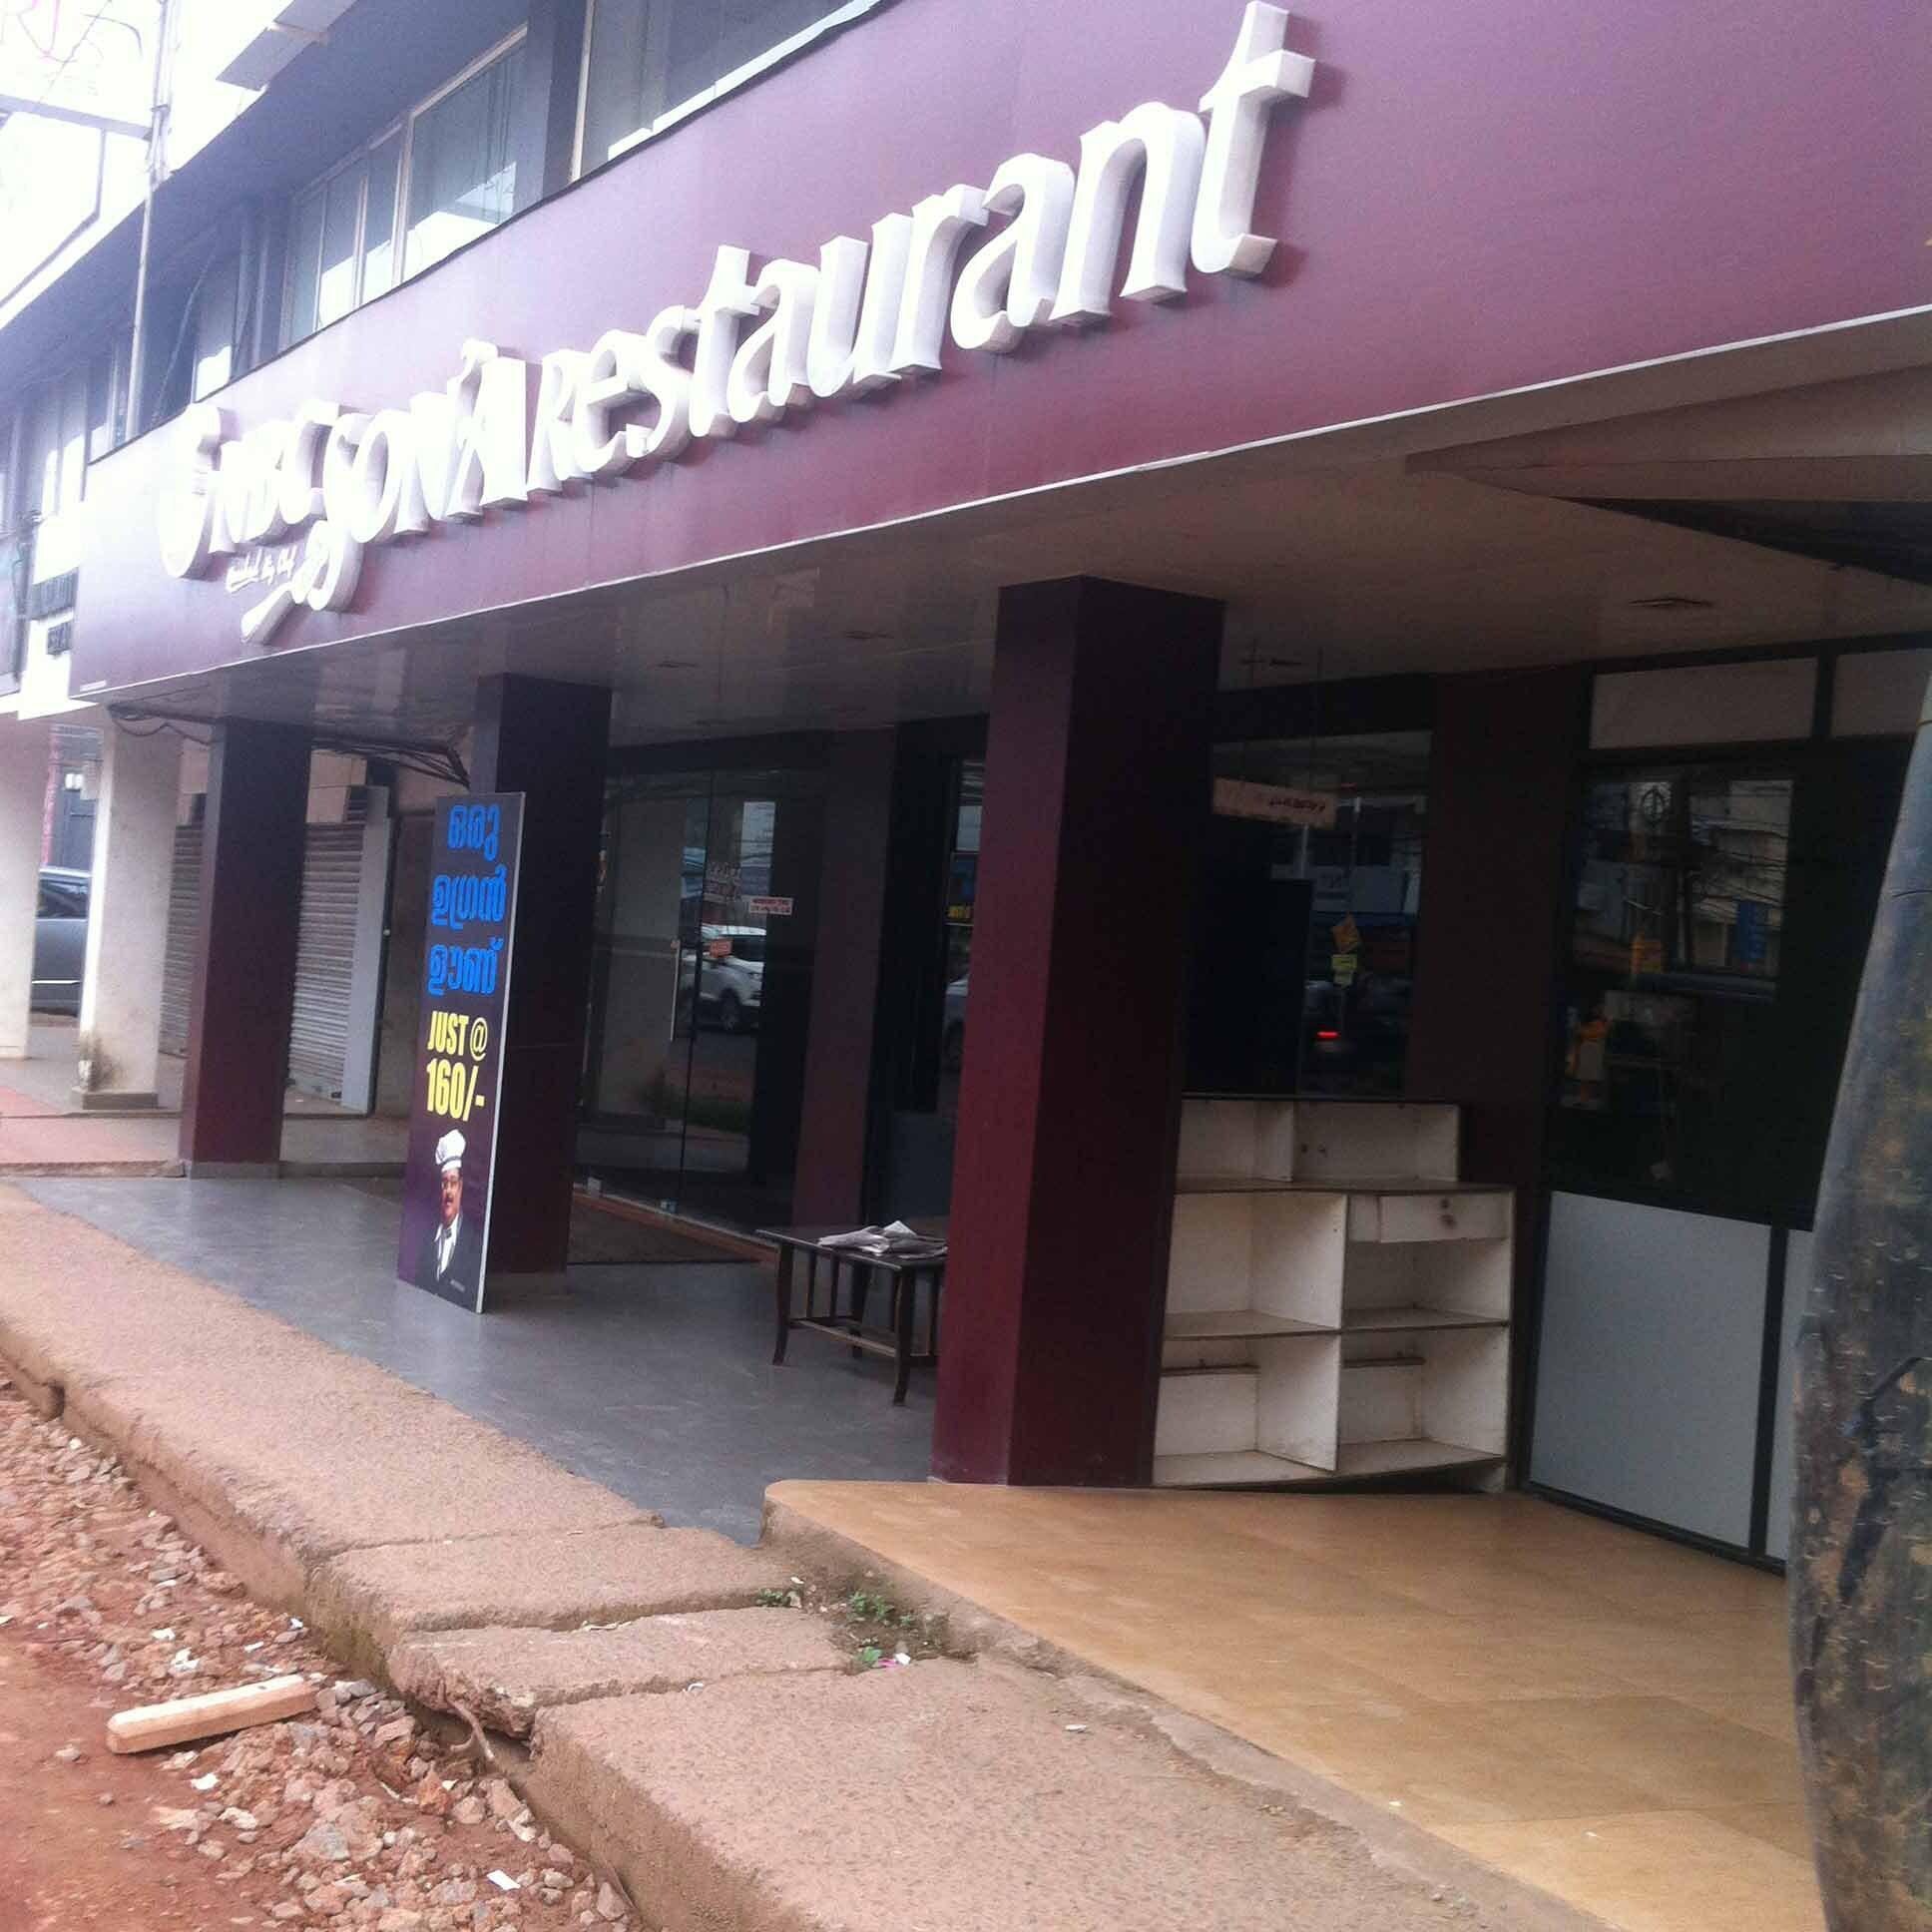 NBC Sona Restaurant - Vyttila - Kochi Image